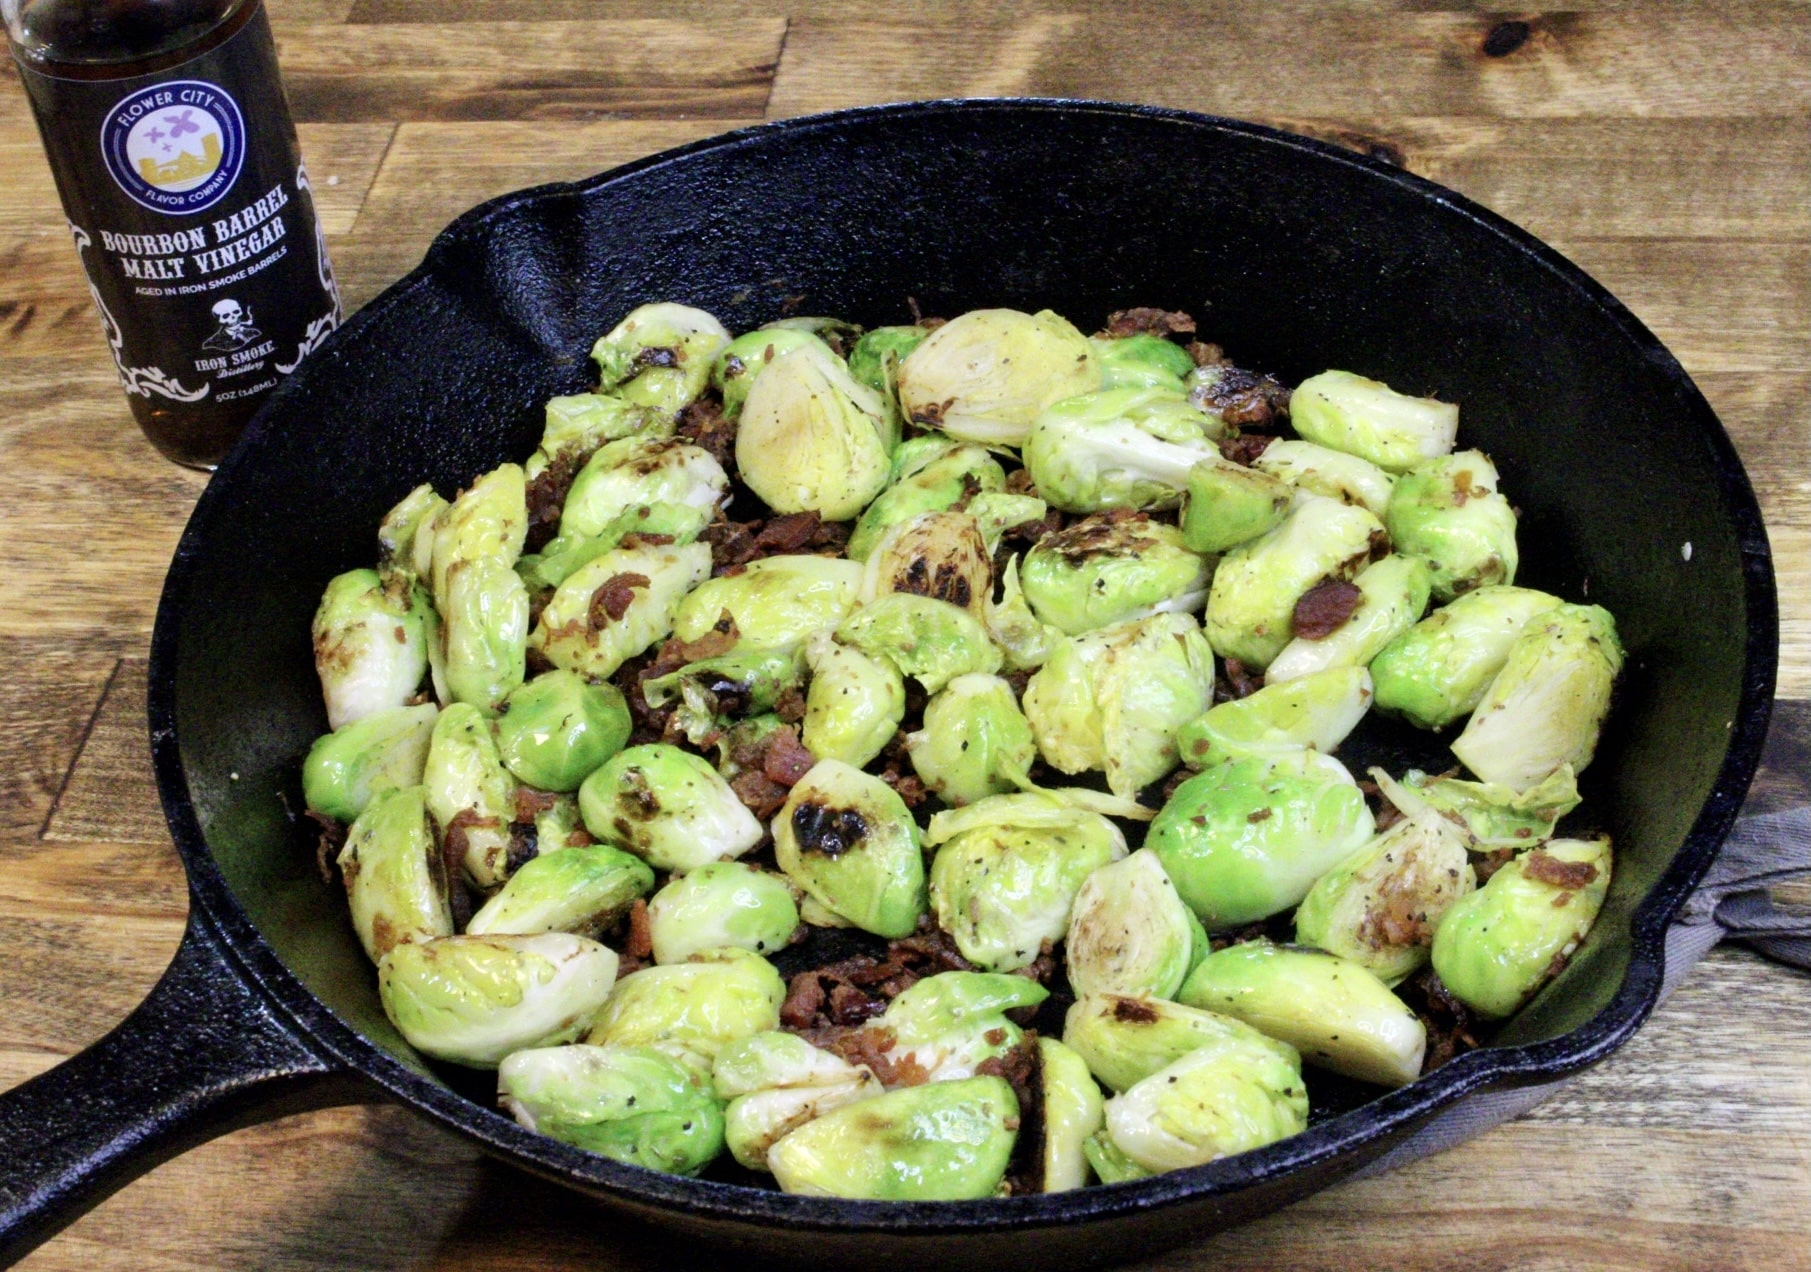 Malt Vinegar Brussels Sprouts